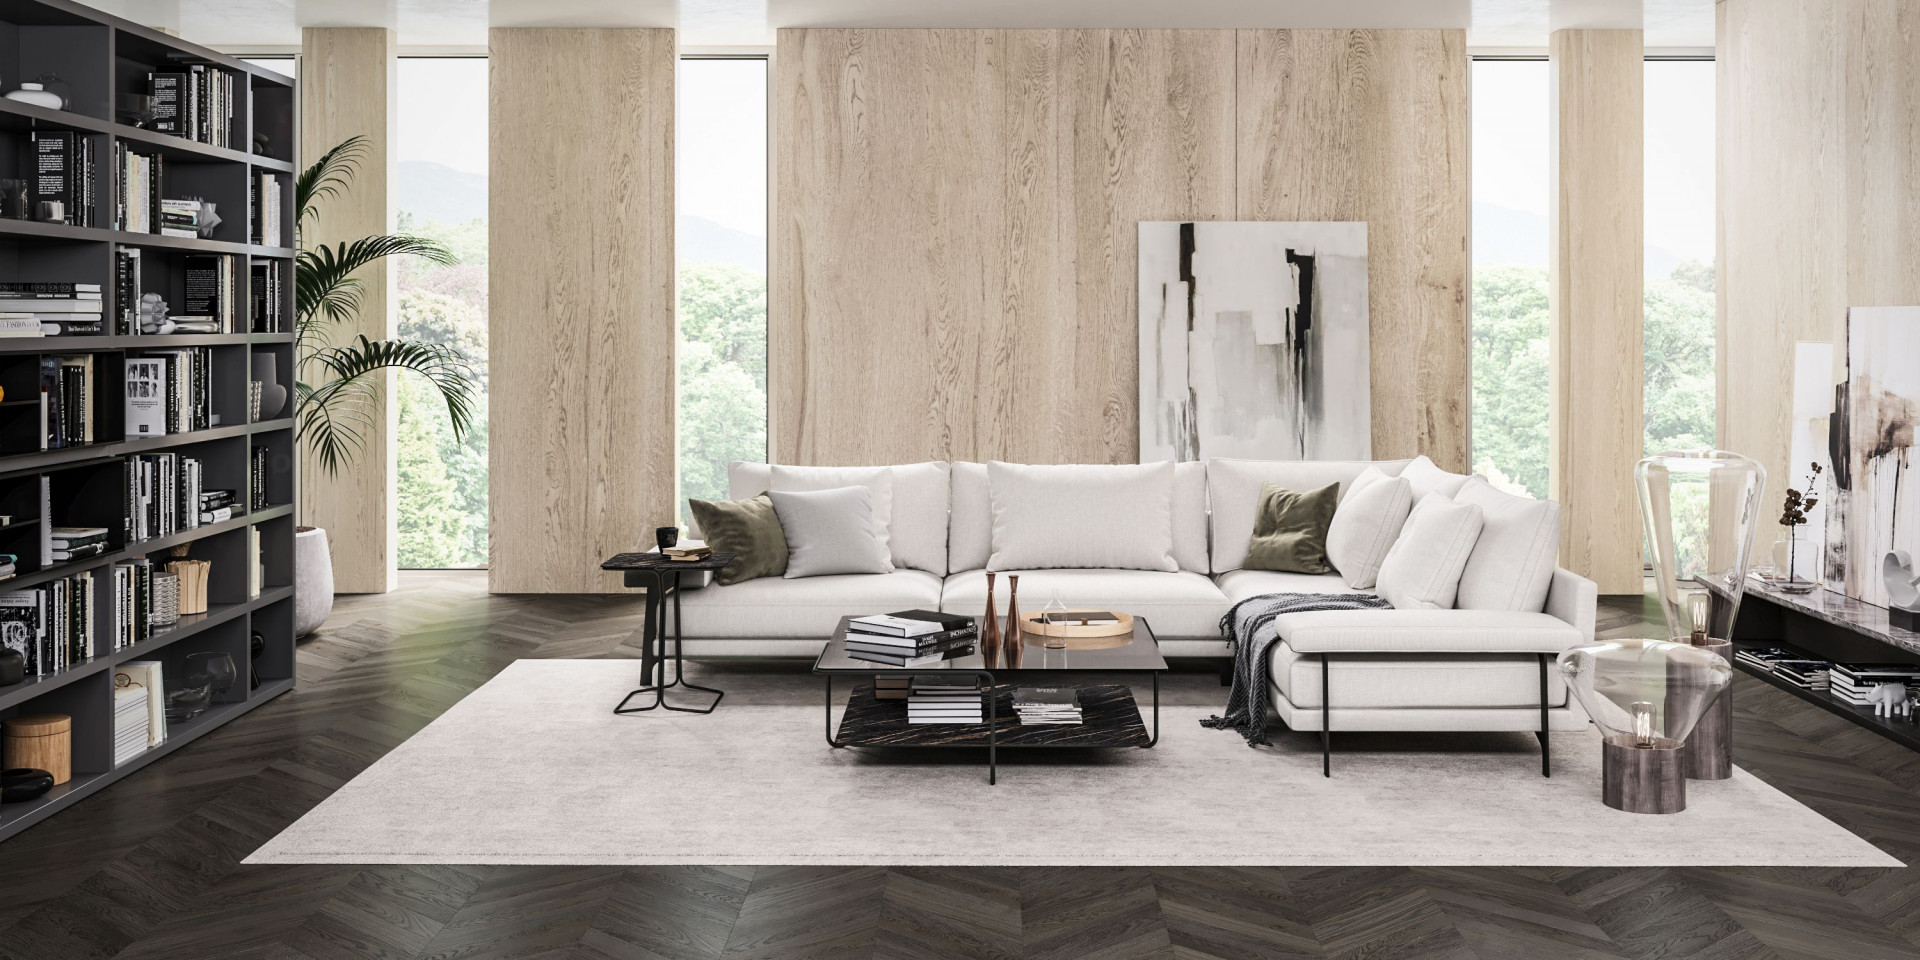 Sofa Onyx firmy Olta. Fot. Olta